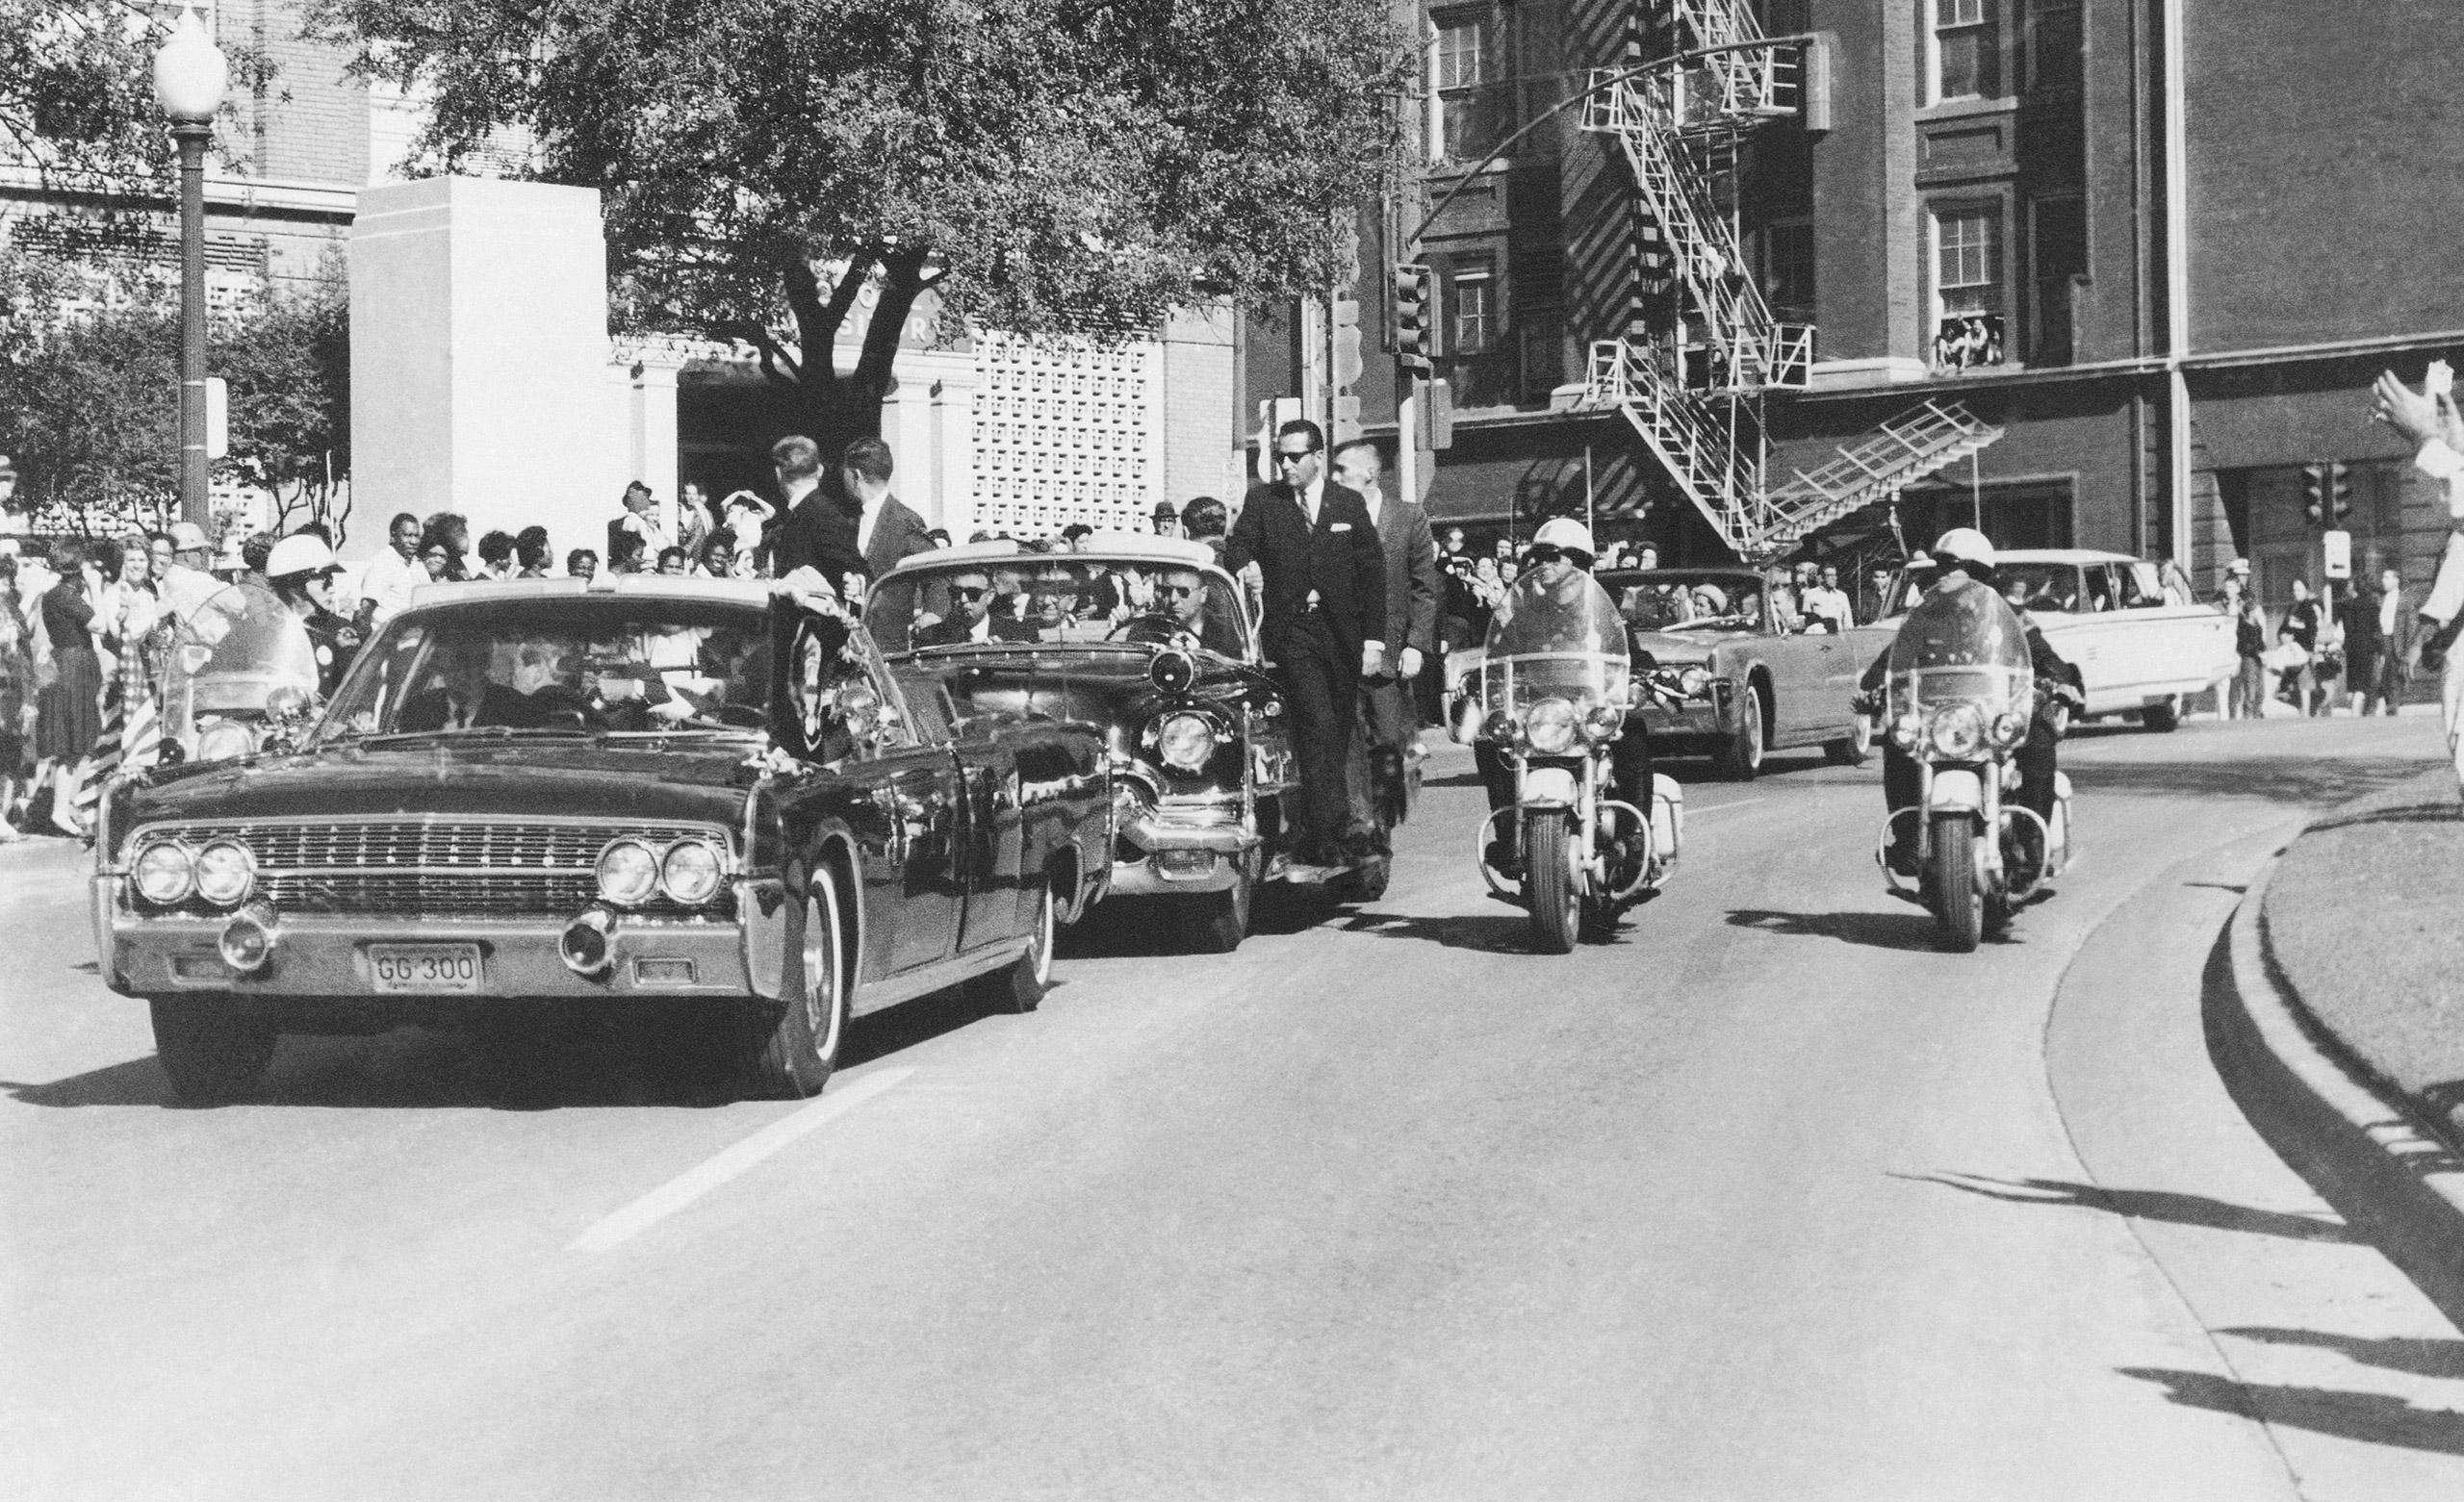 Kennedy Assassination 1963